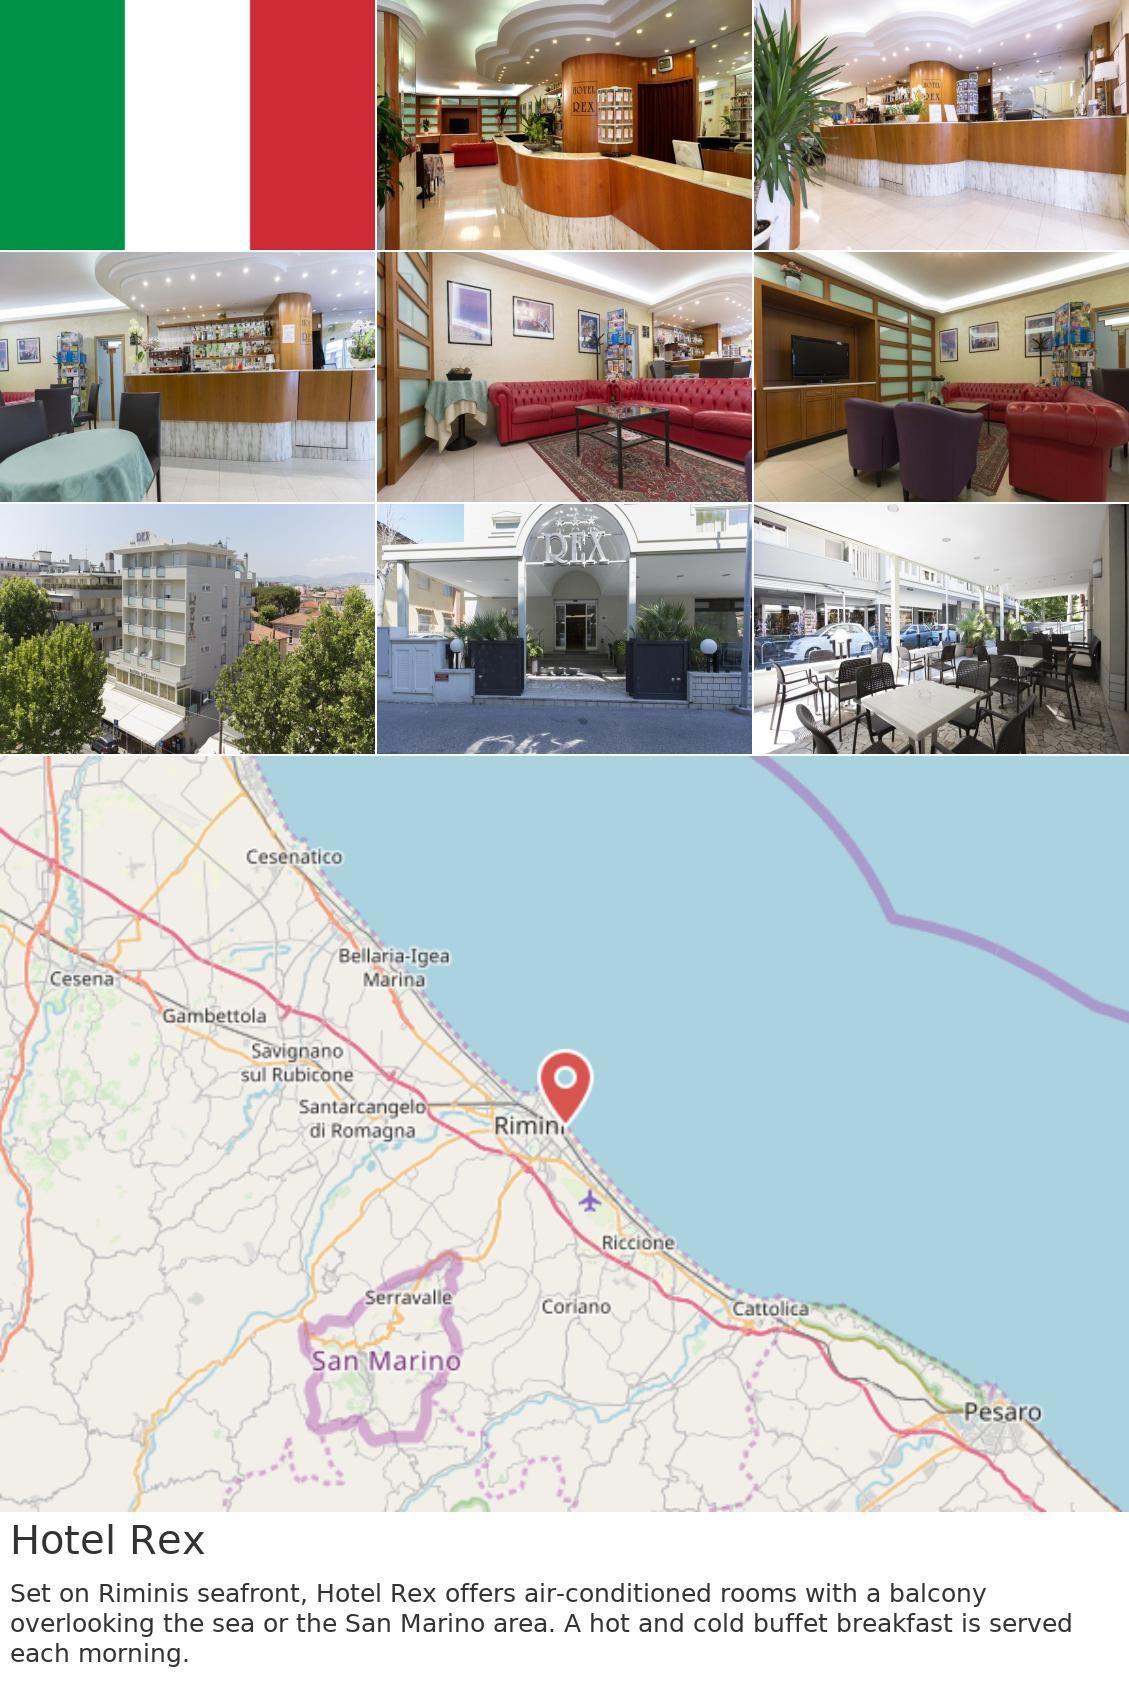 Europe Italy Rimini Hotel Rex Set On Rimini S Seafront Hotel